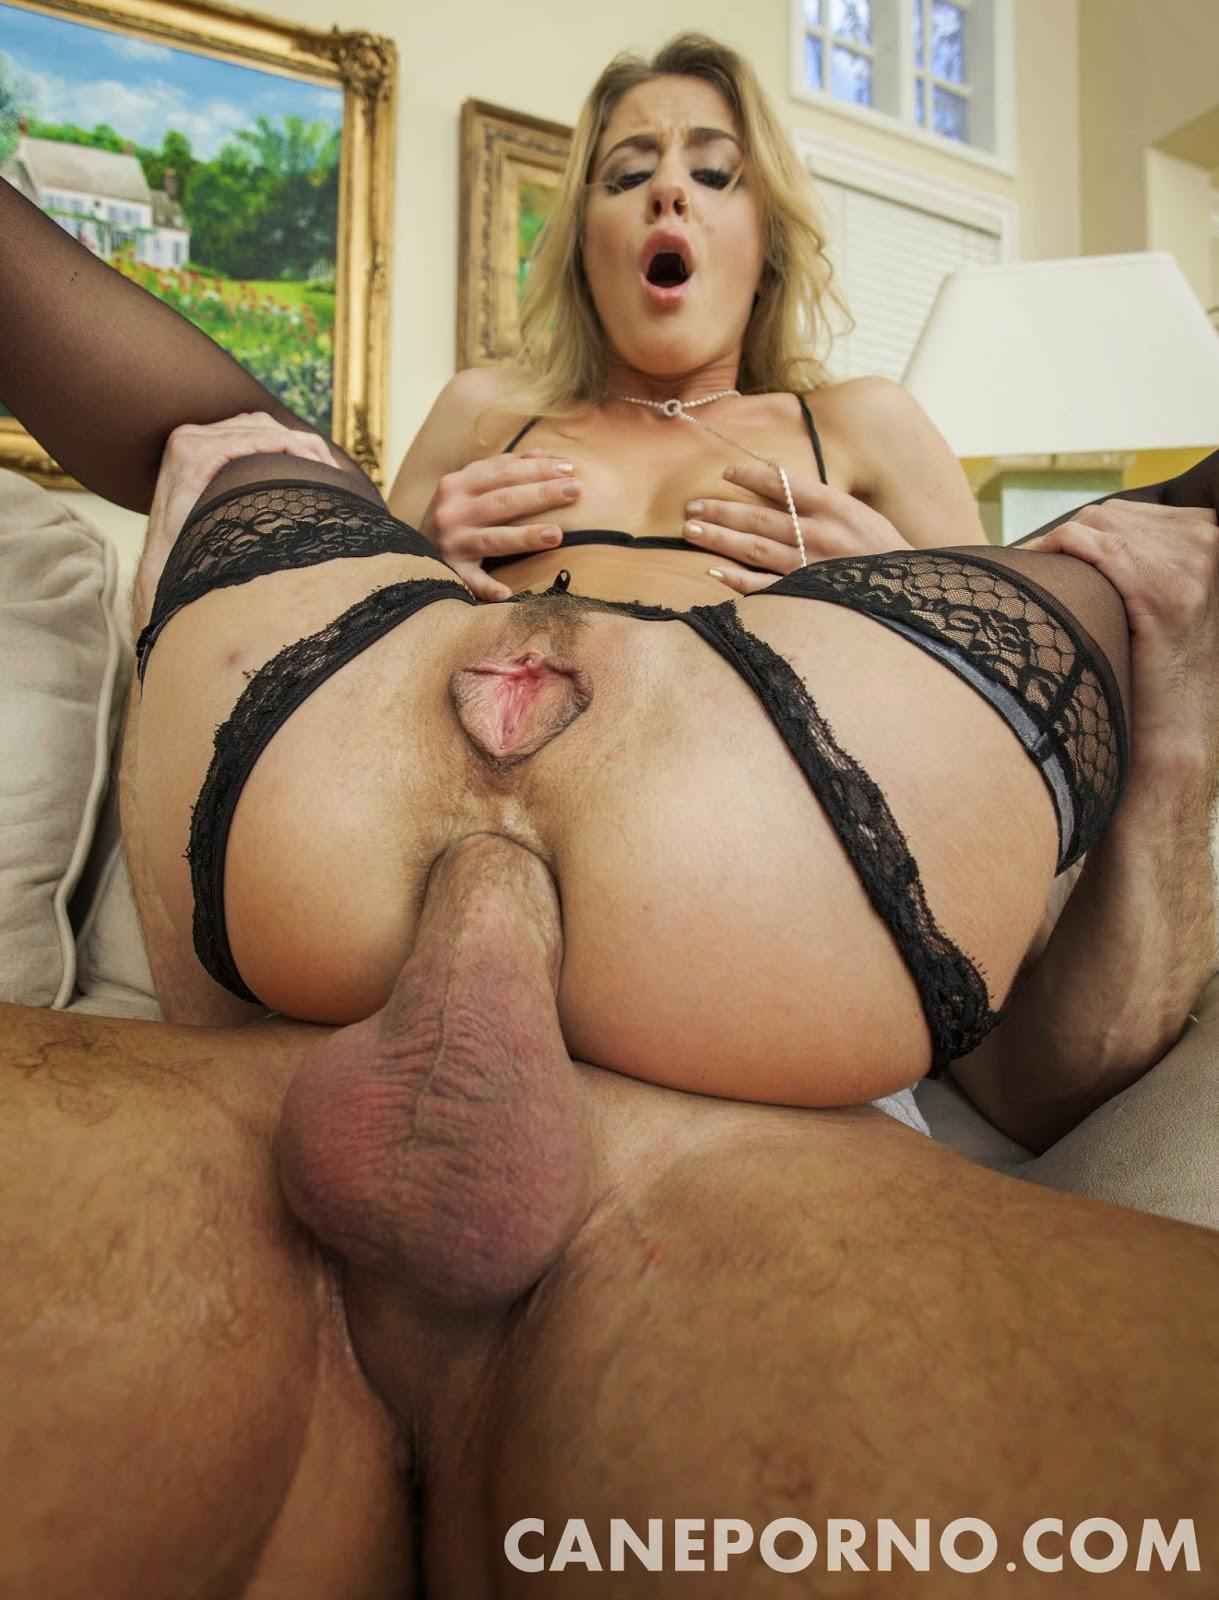 Donne Mature X Sesso Porno Maschi Gay